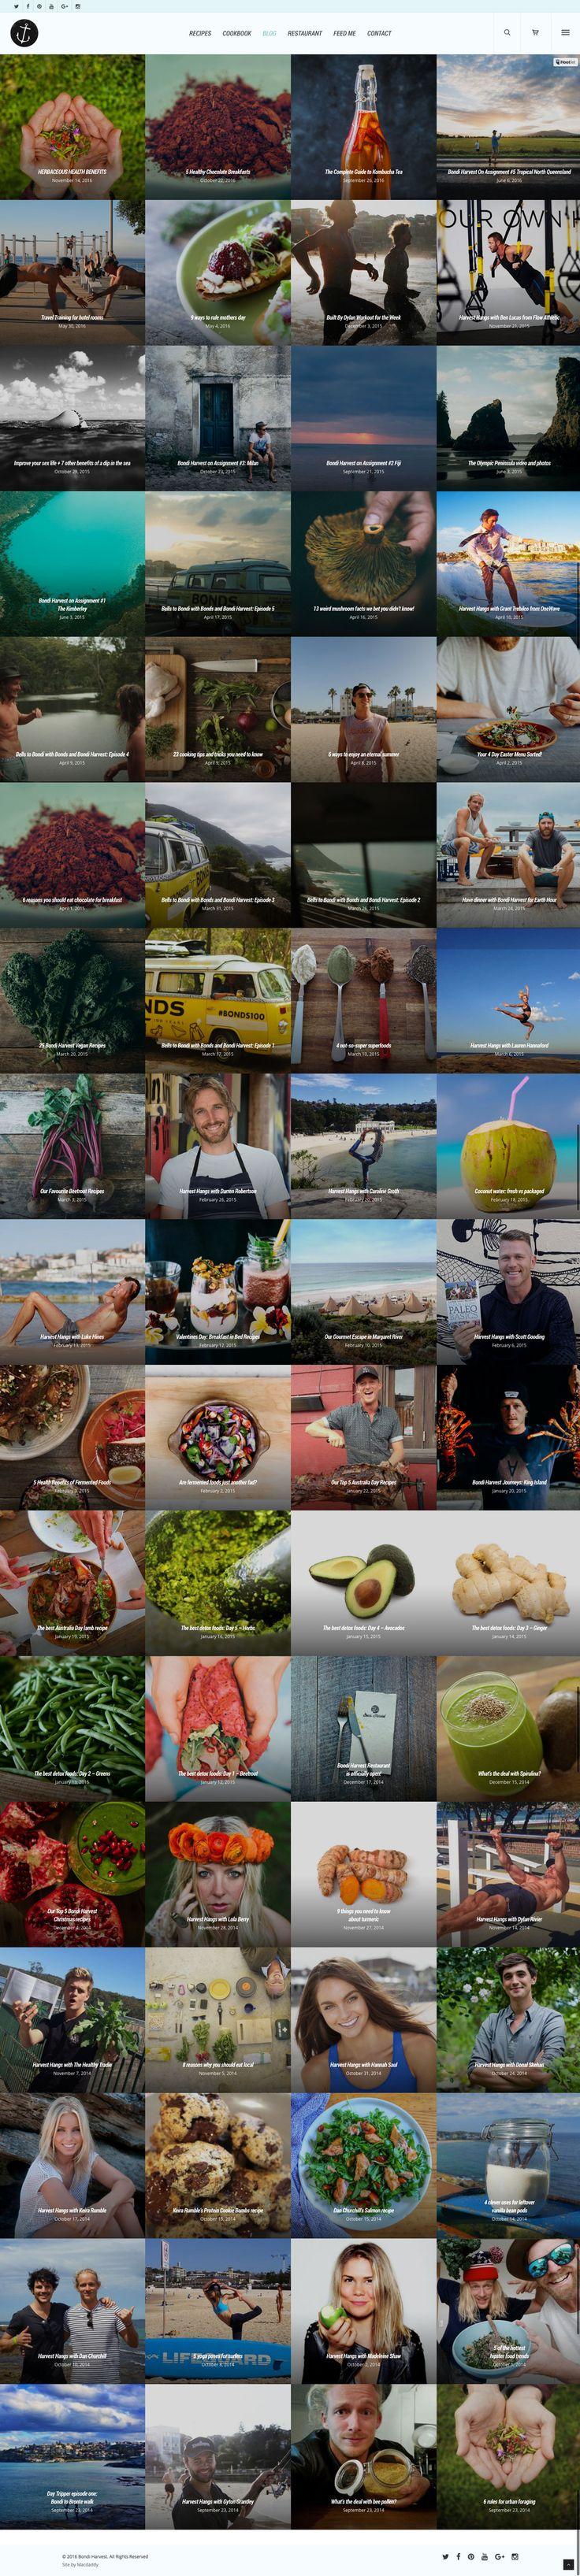 Bondi Harvest website by KORE (http://kore.digital/). The home of food porn. Blog index.